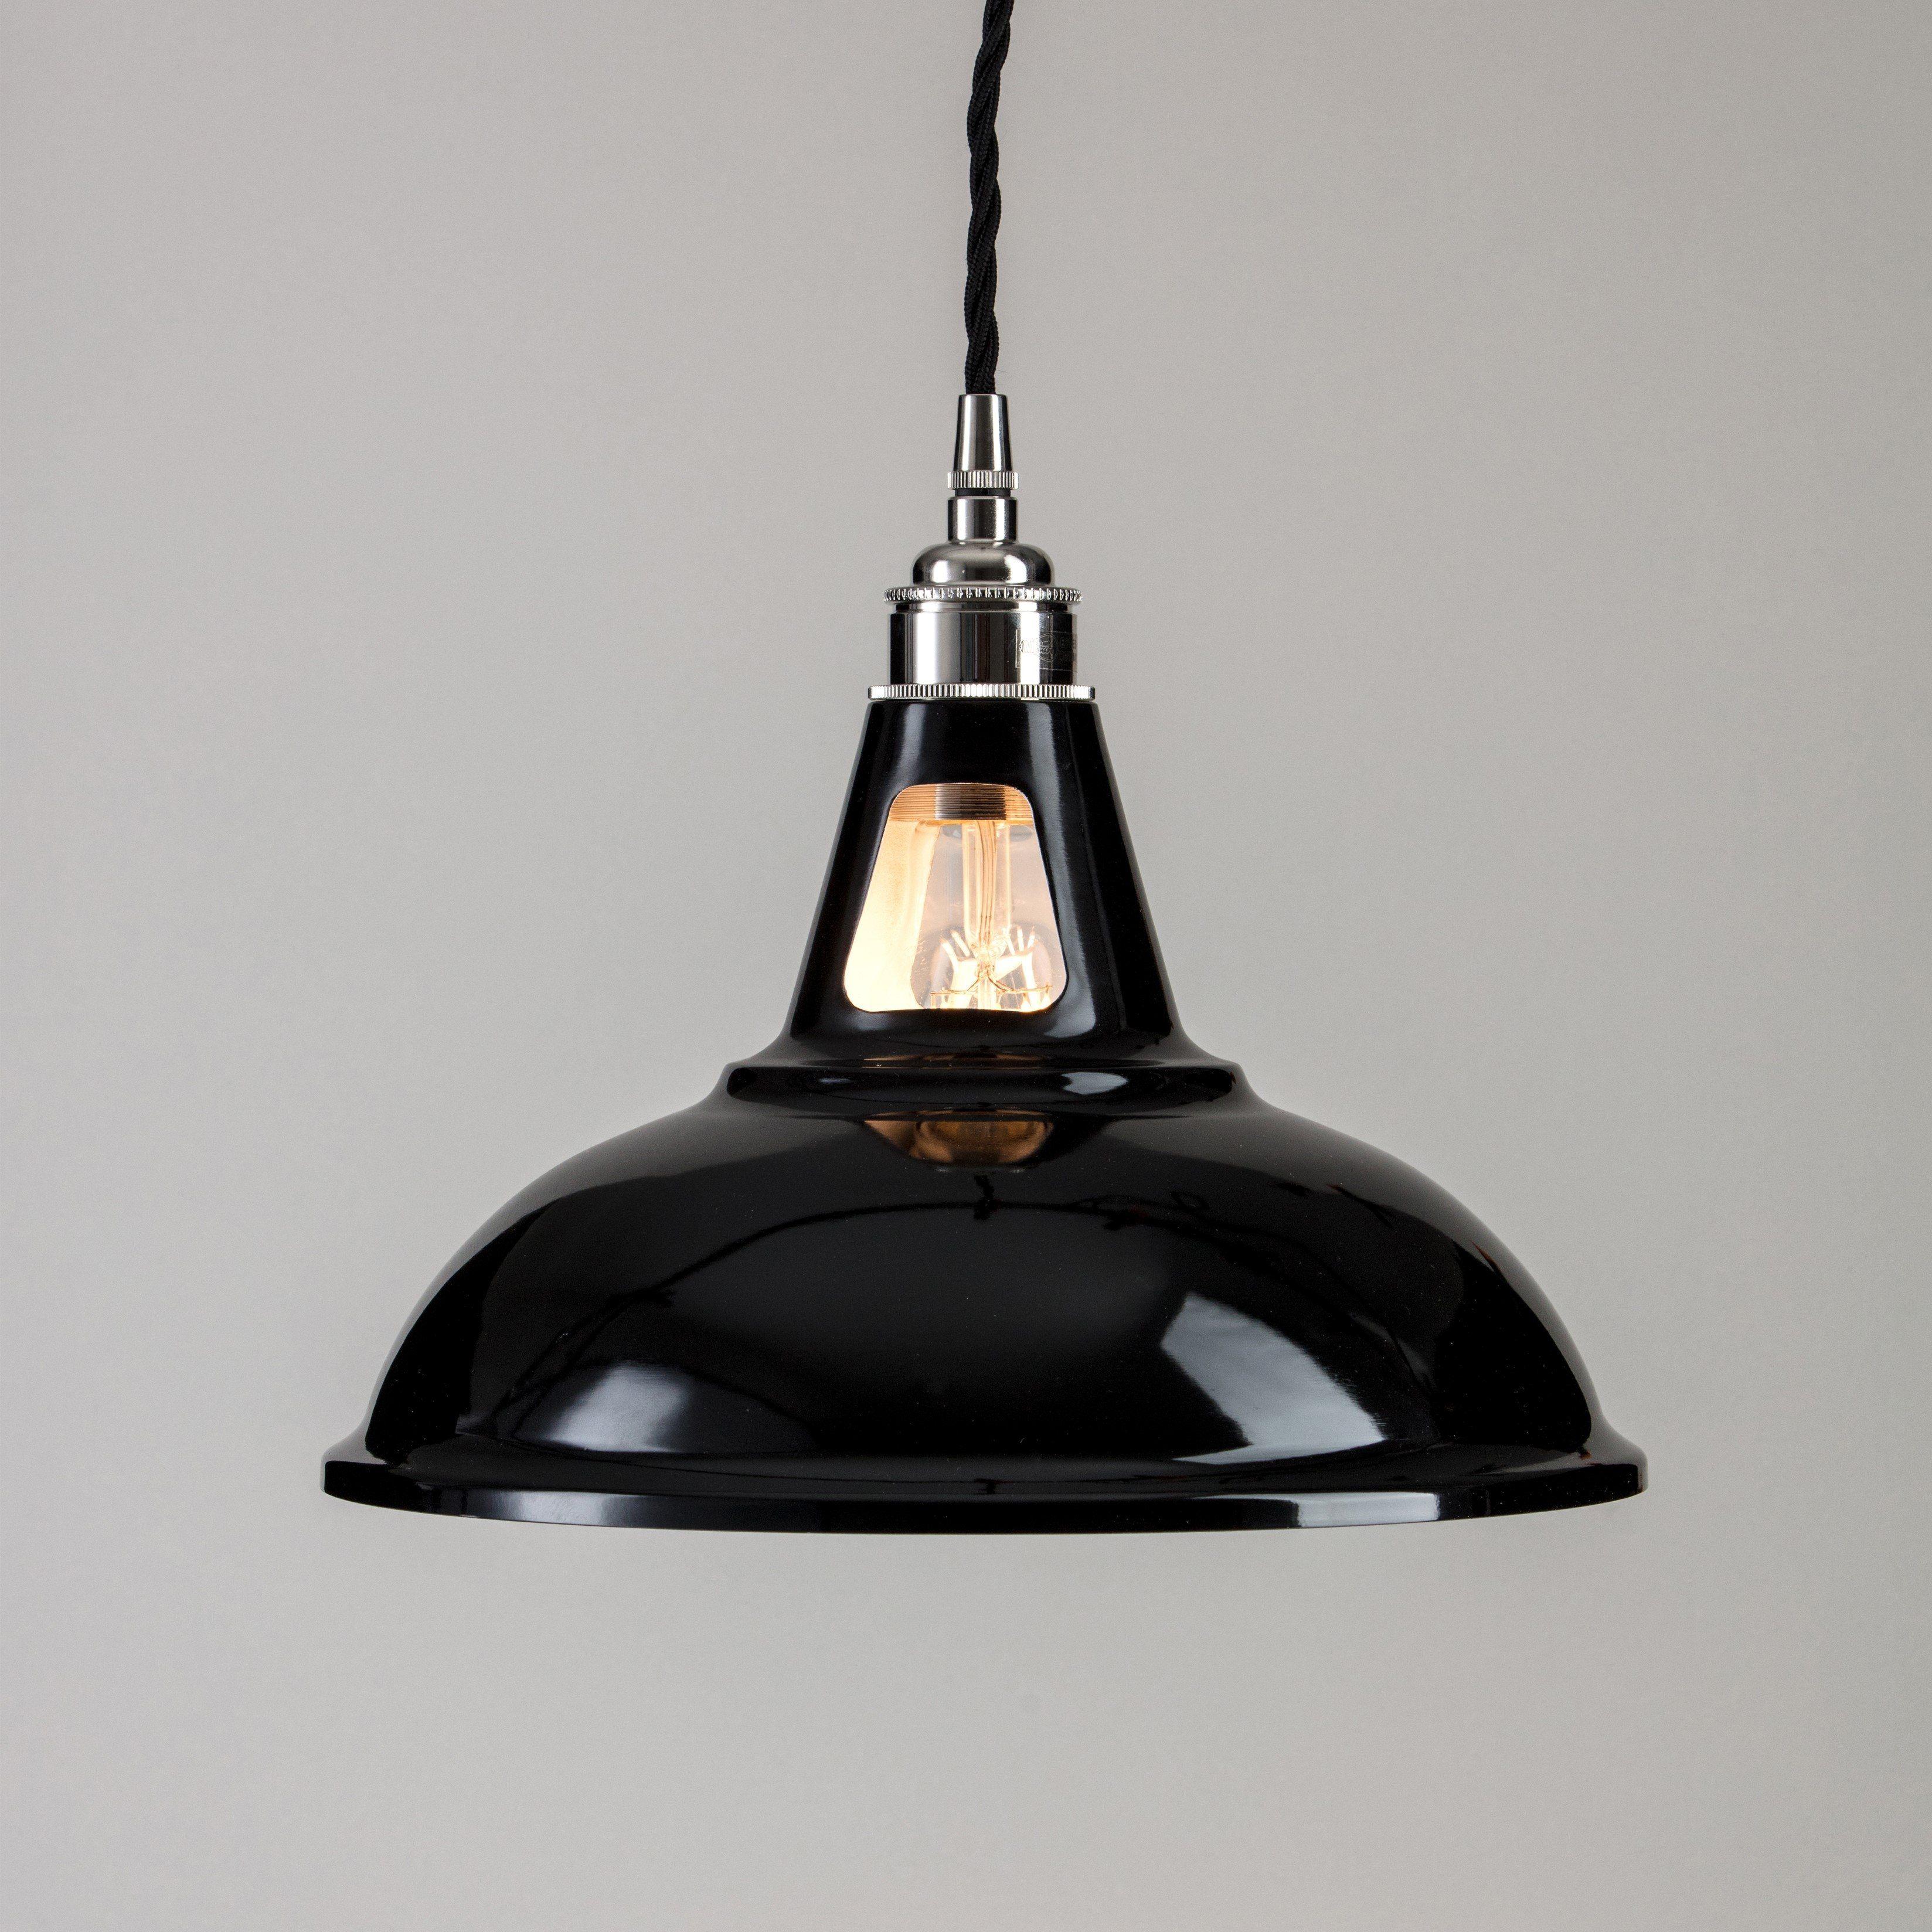 Factory Pendant Light Black Grace Glory Our Lighting